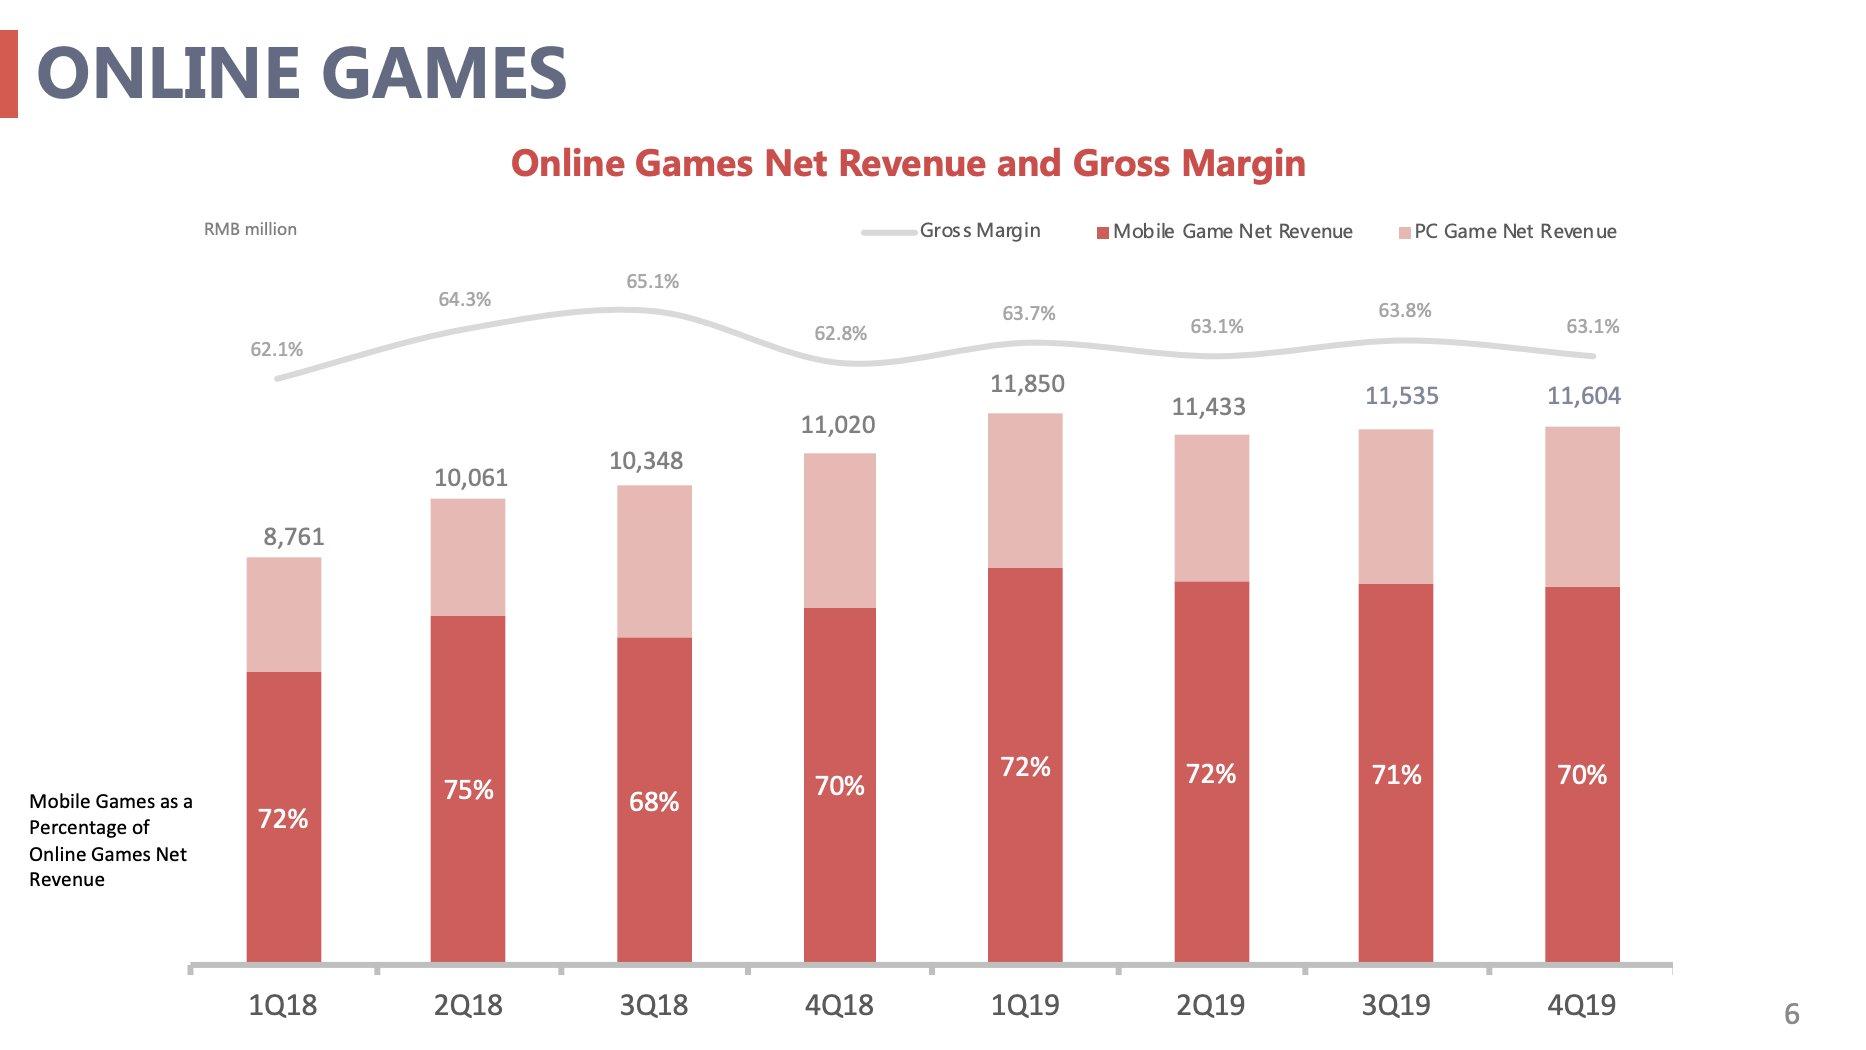 Online Games Net Revenue & Gross Margin